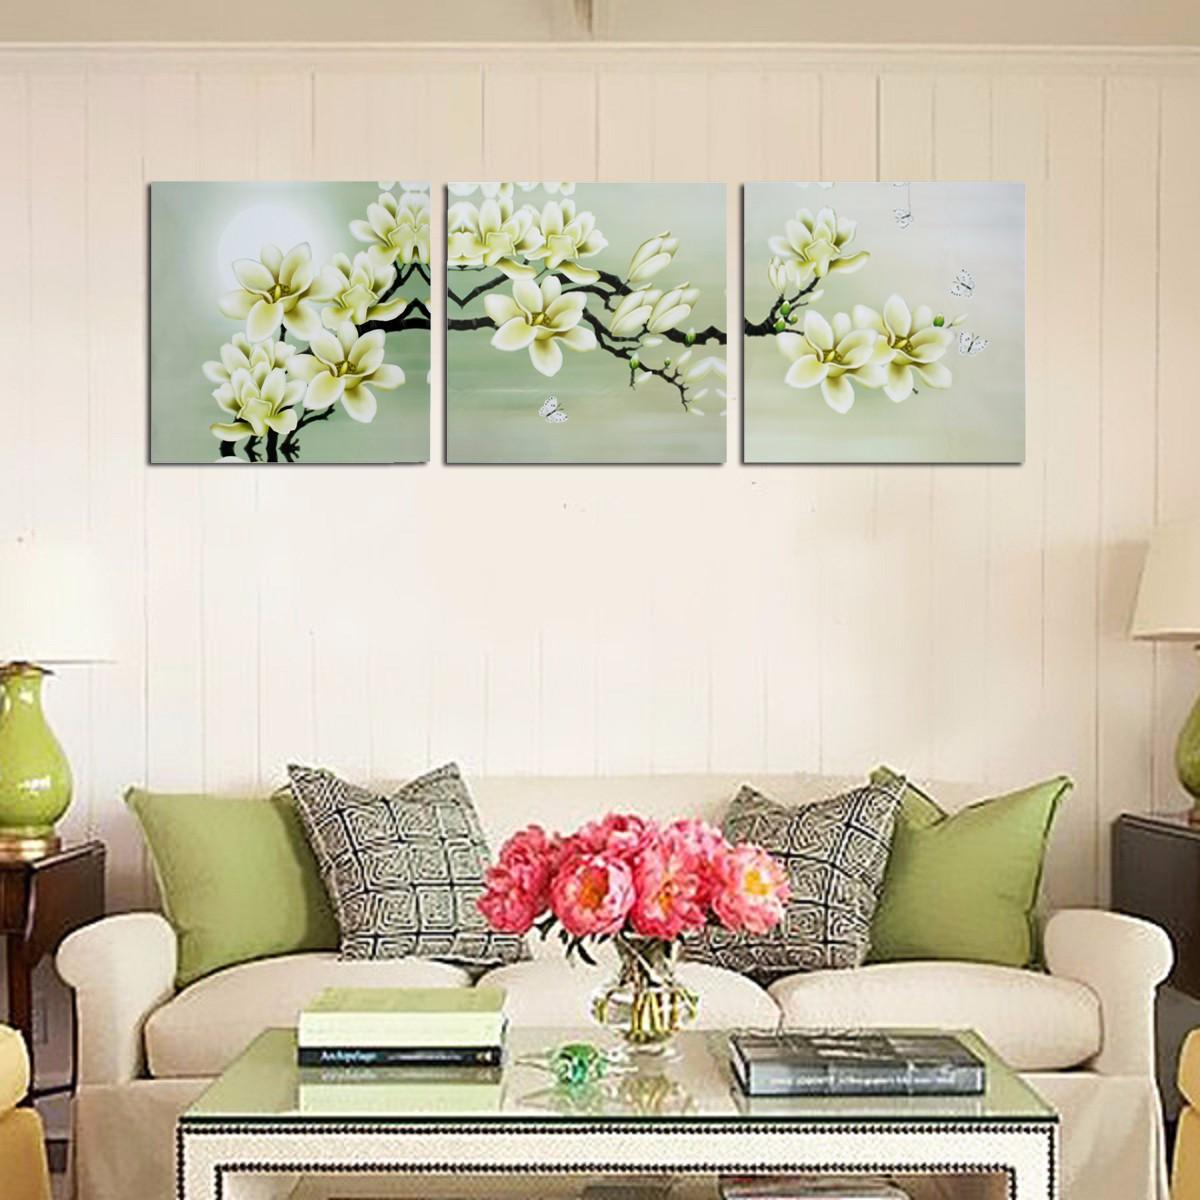 3Pcs Magnolia Spray Oil Paint Flower Painting Triptych